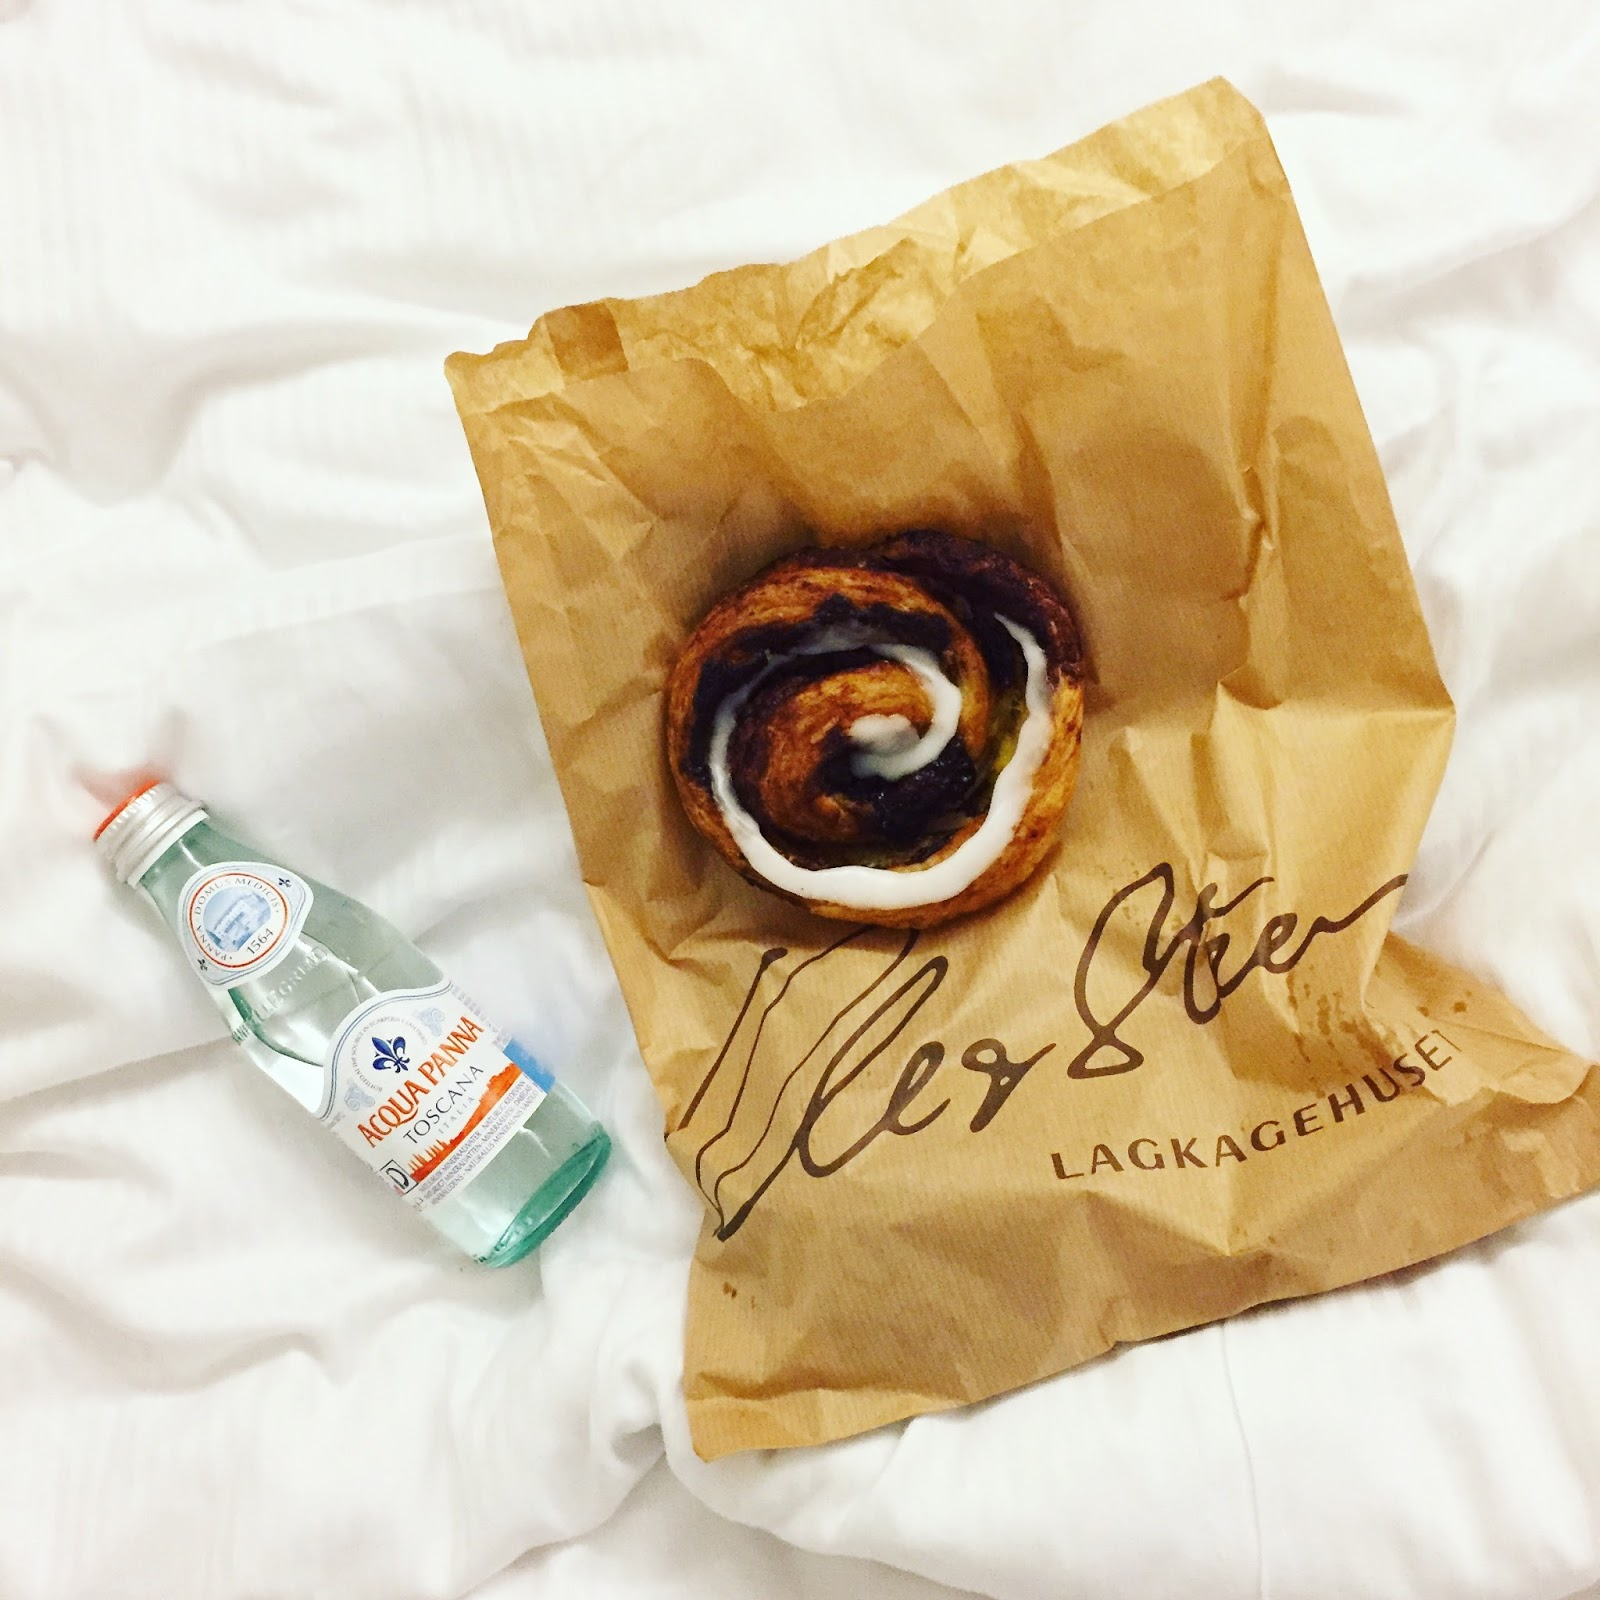 Cinnamon-Roll-Bakery-Copenhagen